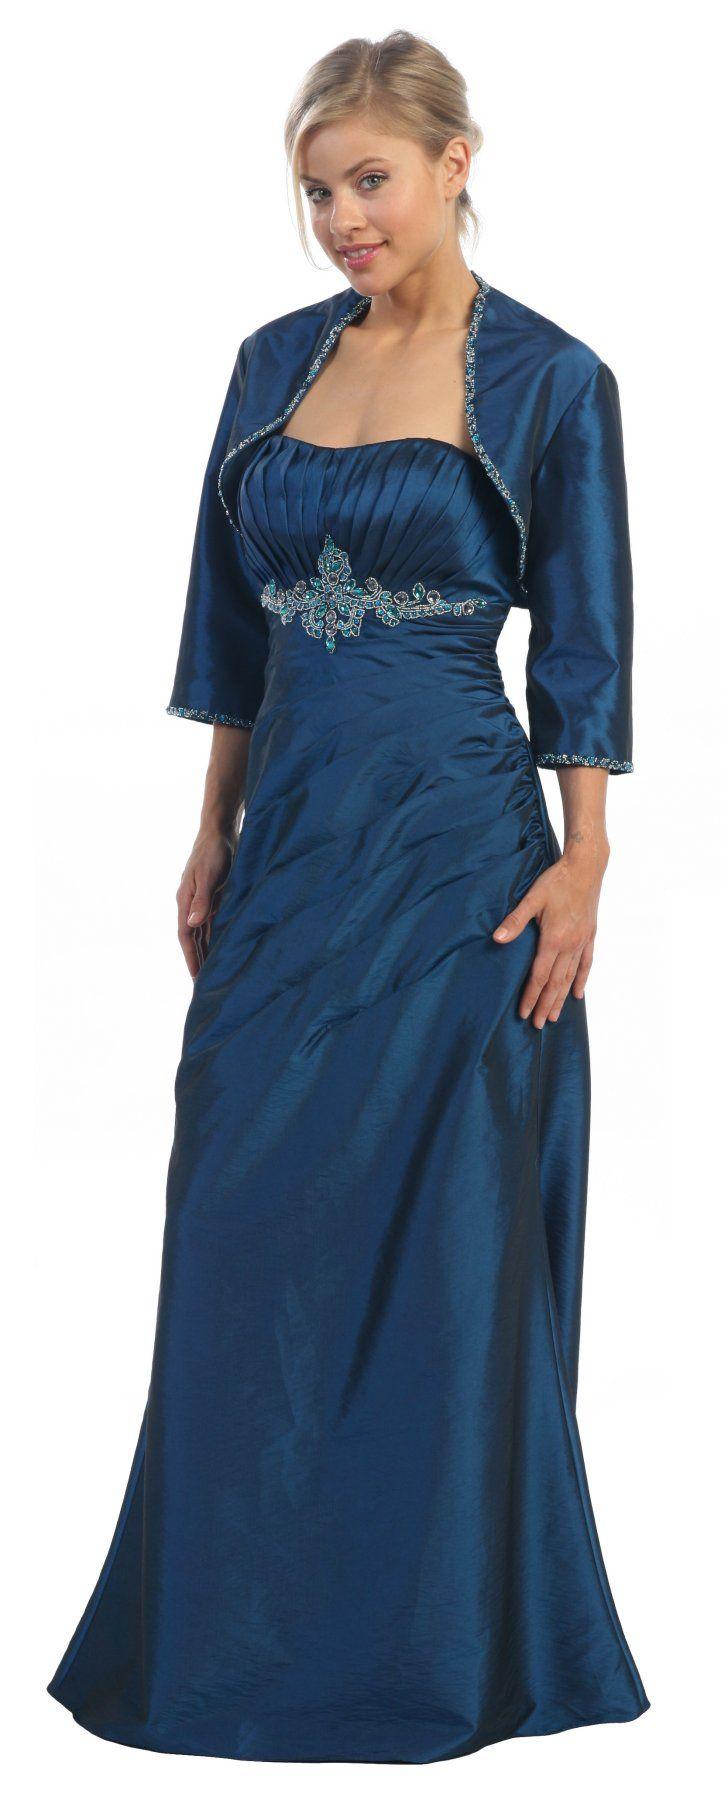 Strapless Royal Blue Teal Mother Bride Dress Mid Length